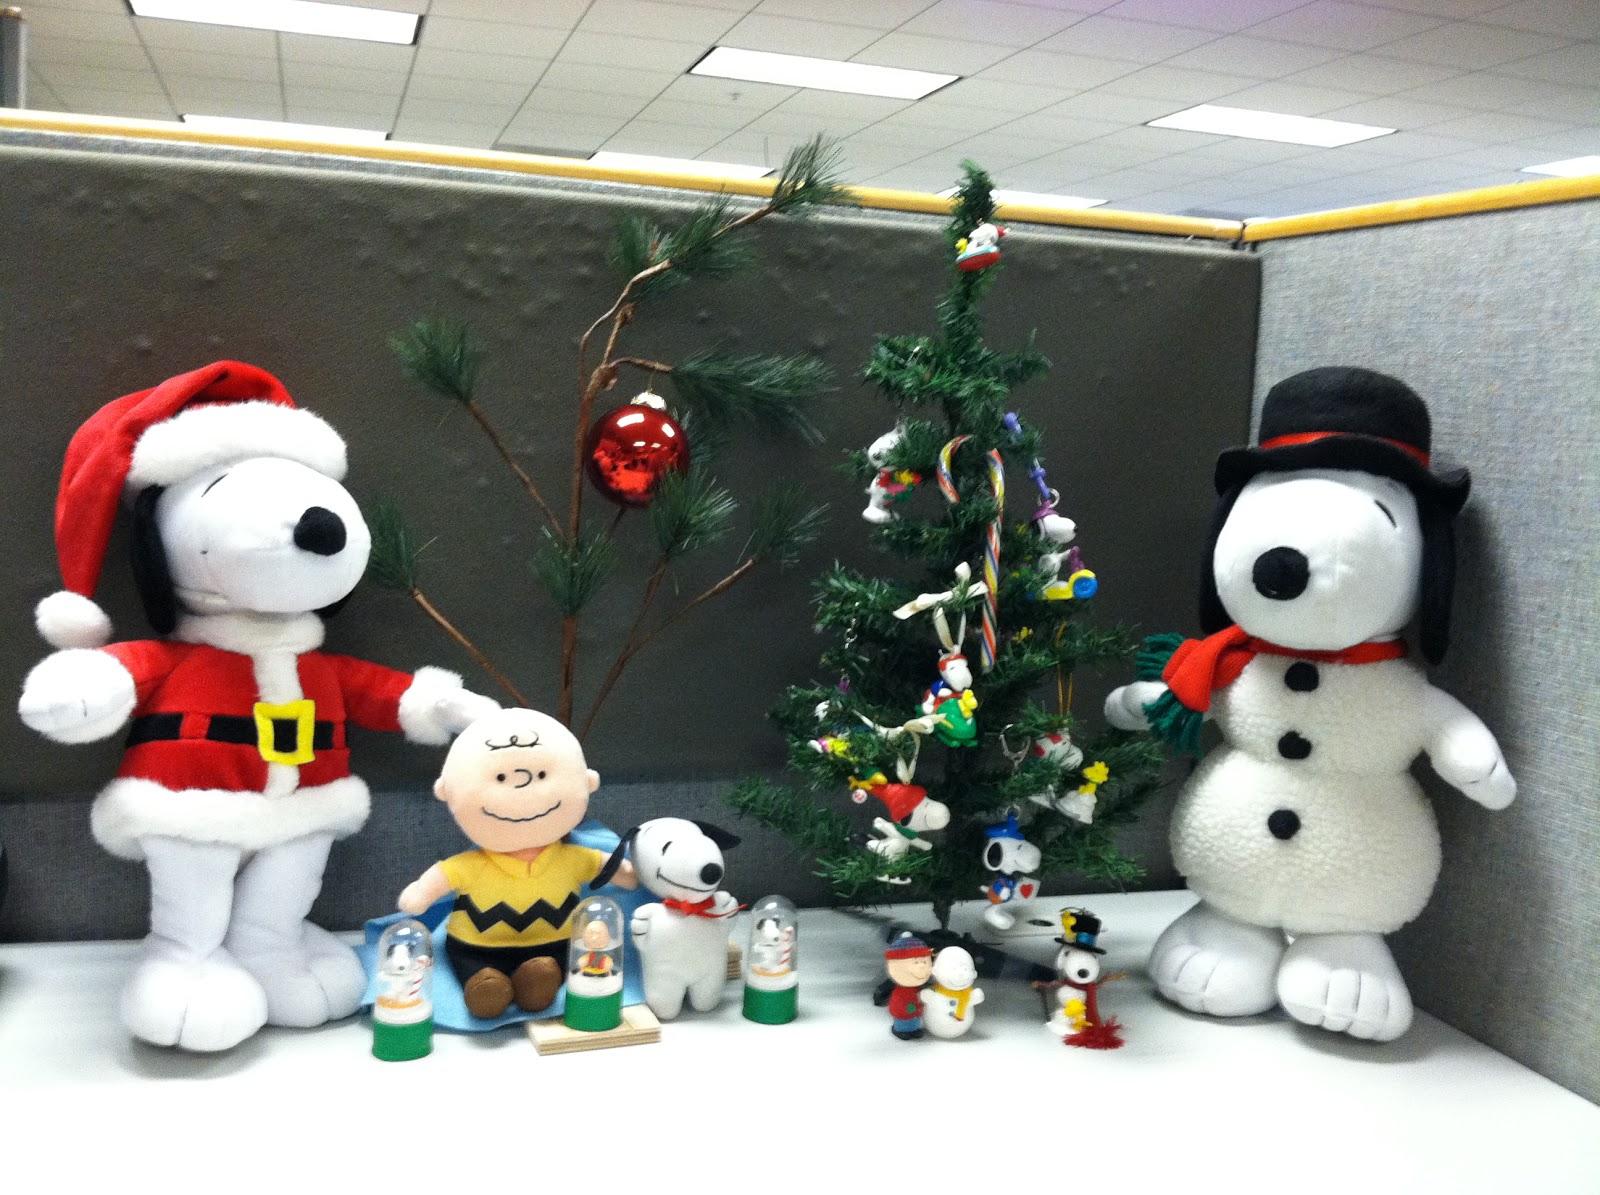 santa snoopy charlie brown christmas tree snoopy christmas tree made with snoopy ornaments and snoopy key chains snoopy snowman charlie brown that plays - When Was Charlie Brown Christmas Made